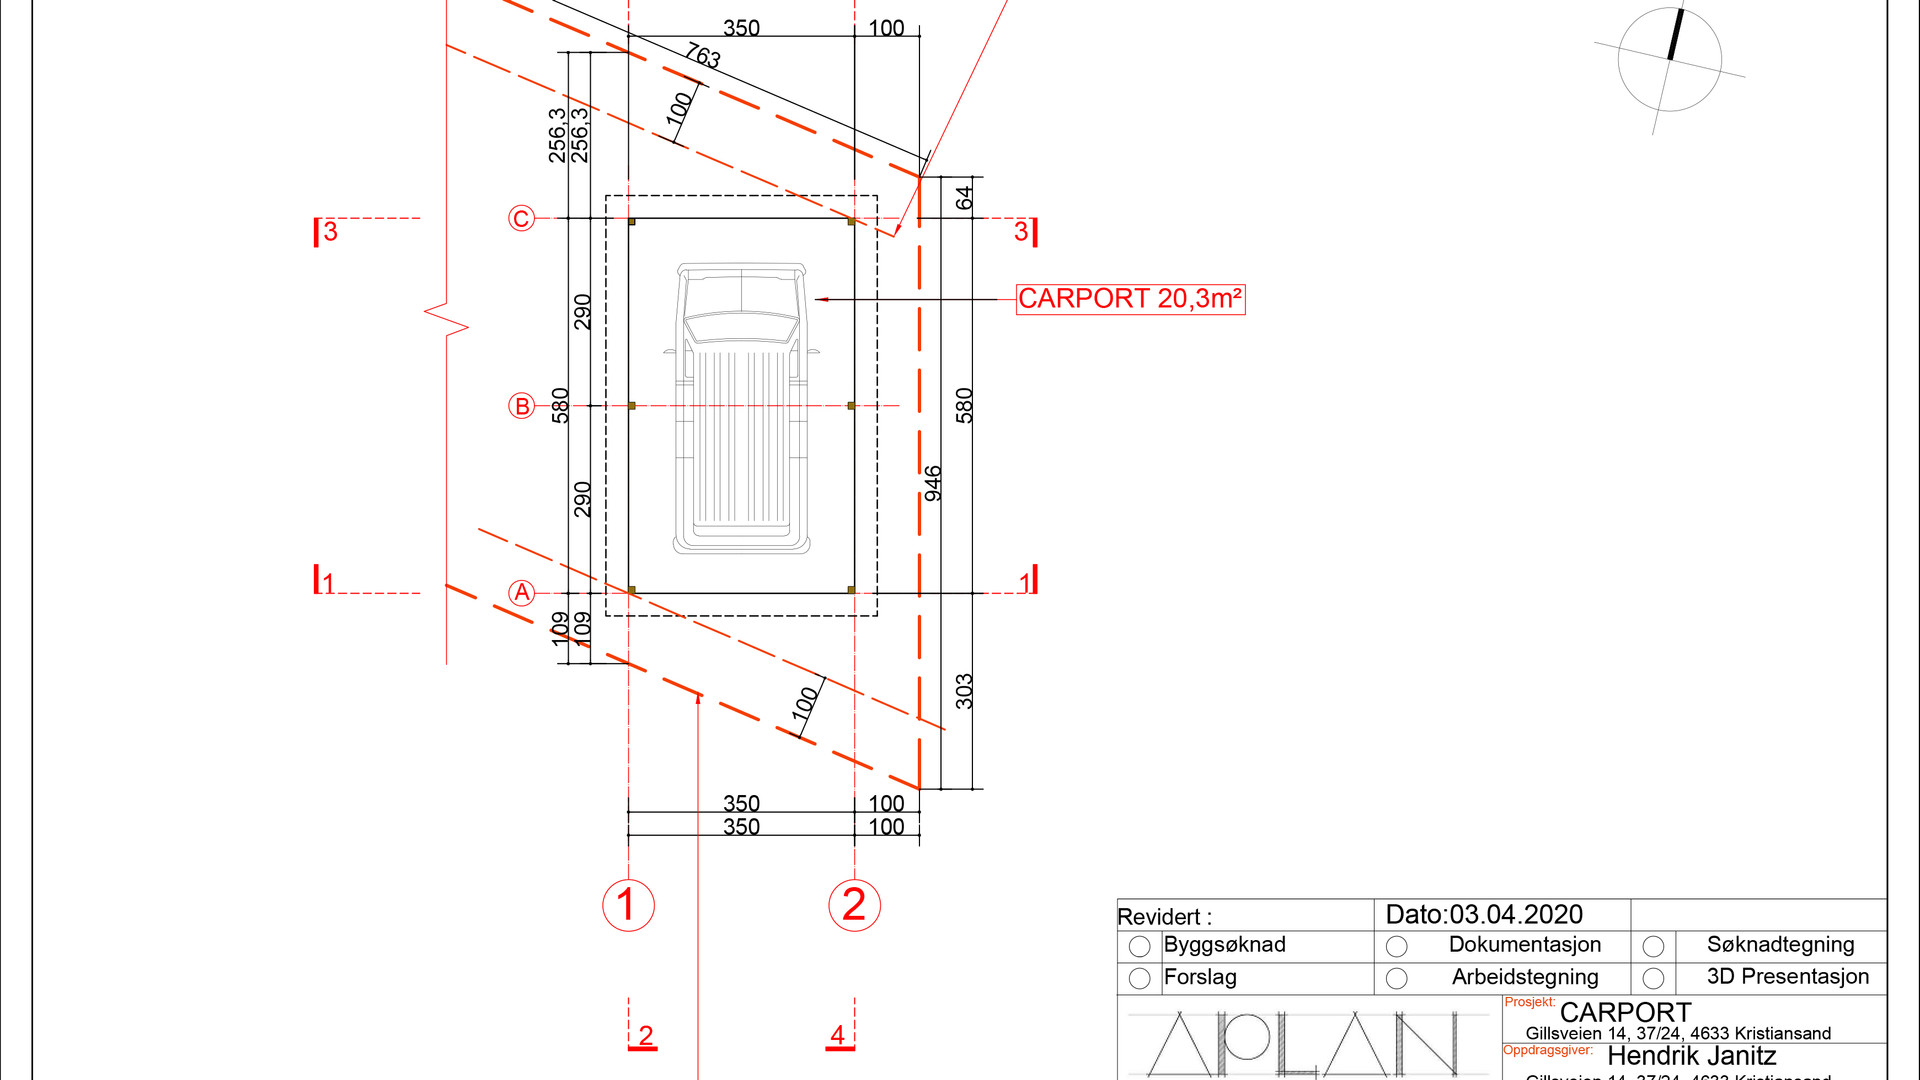 A3-PLAN CARPORT.jpg